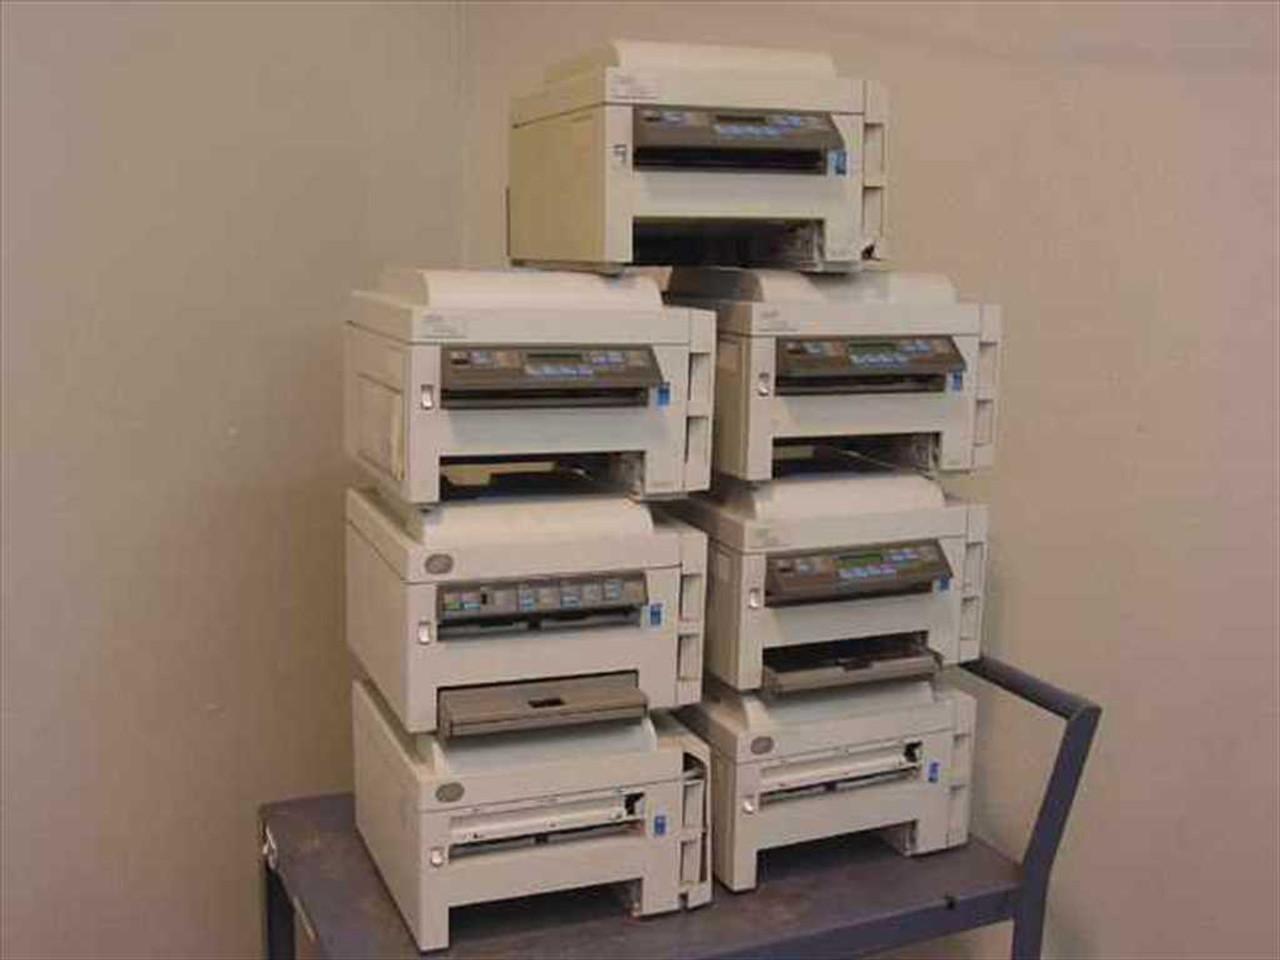 IBM 4029-020/4019-E01/4019 Lexmark Laser Printer 6 - Parts ...